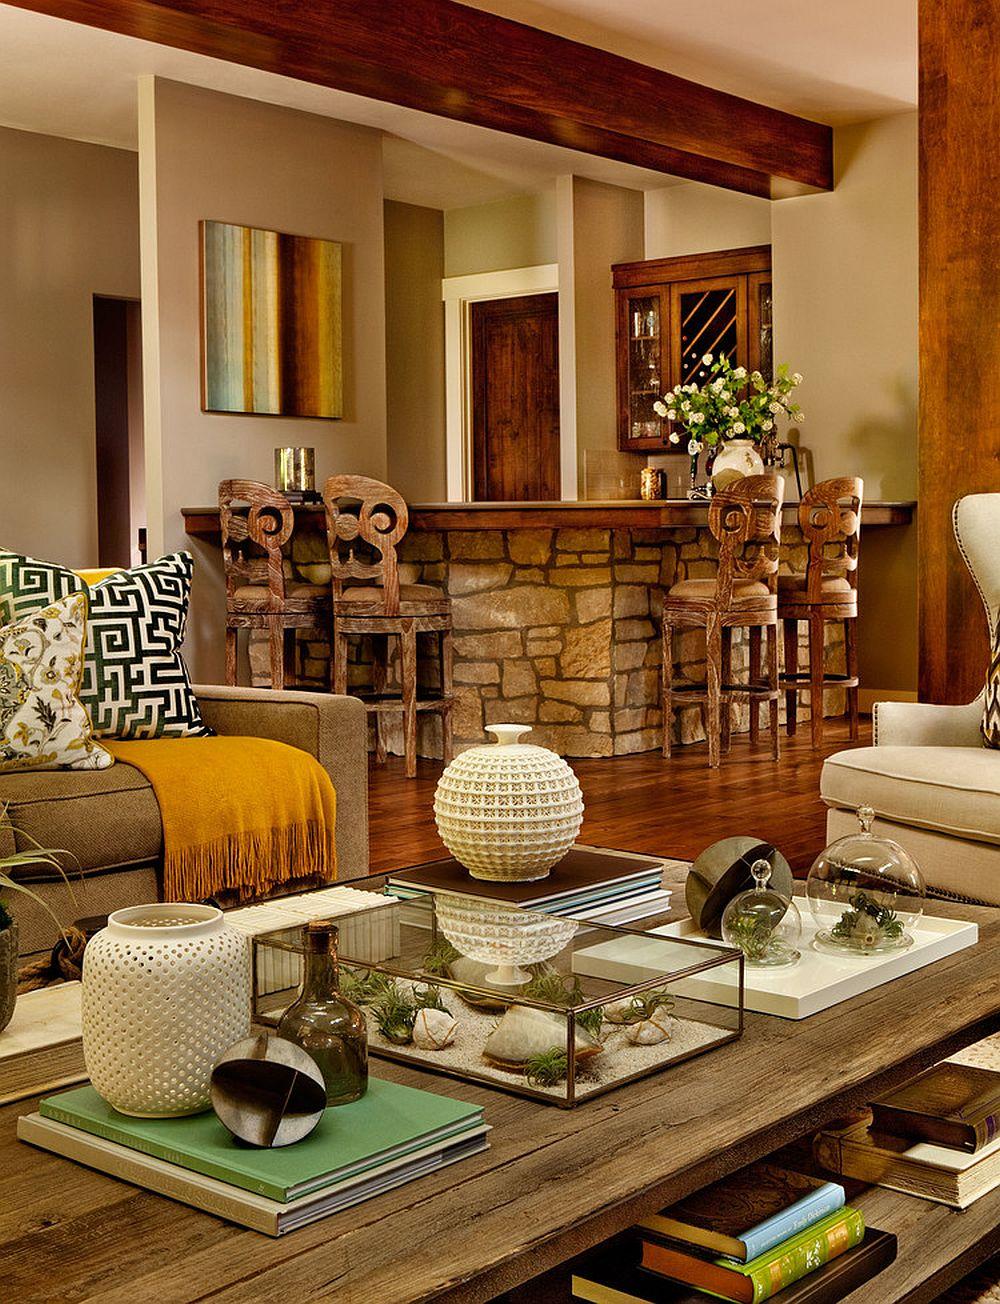 adelaparvu.com despre amenajare interior casa cu accente rustice, designer Garrison Hullinger, Foto blackstoneedge.com Foto (6)